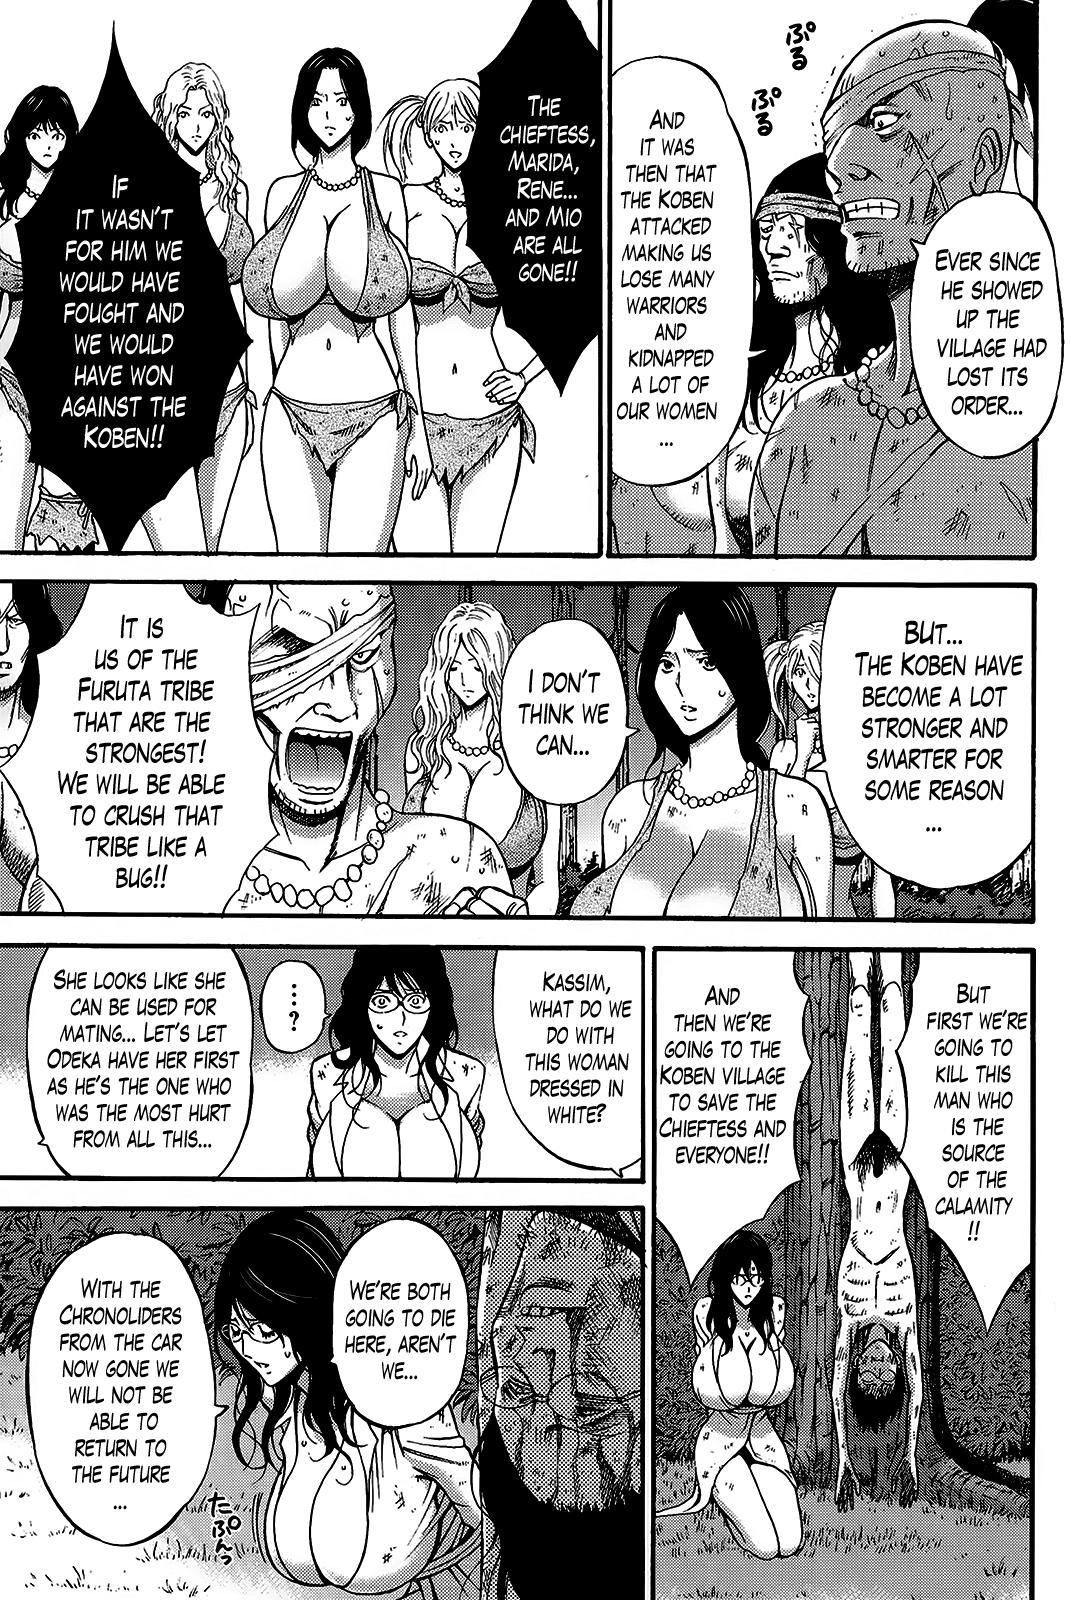 Kigenzen 10000 Nen no Ota | The Otaku in 10,000 B.C. 162